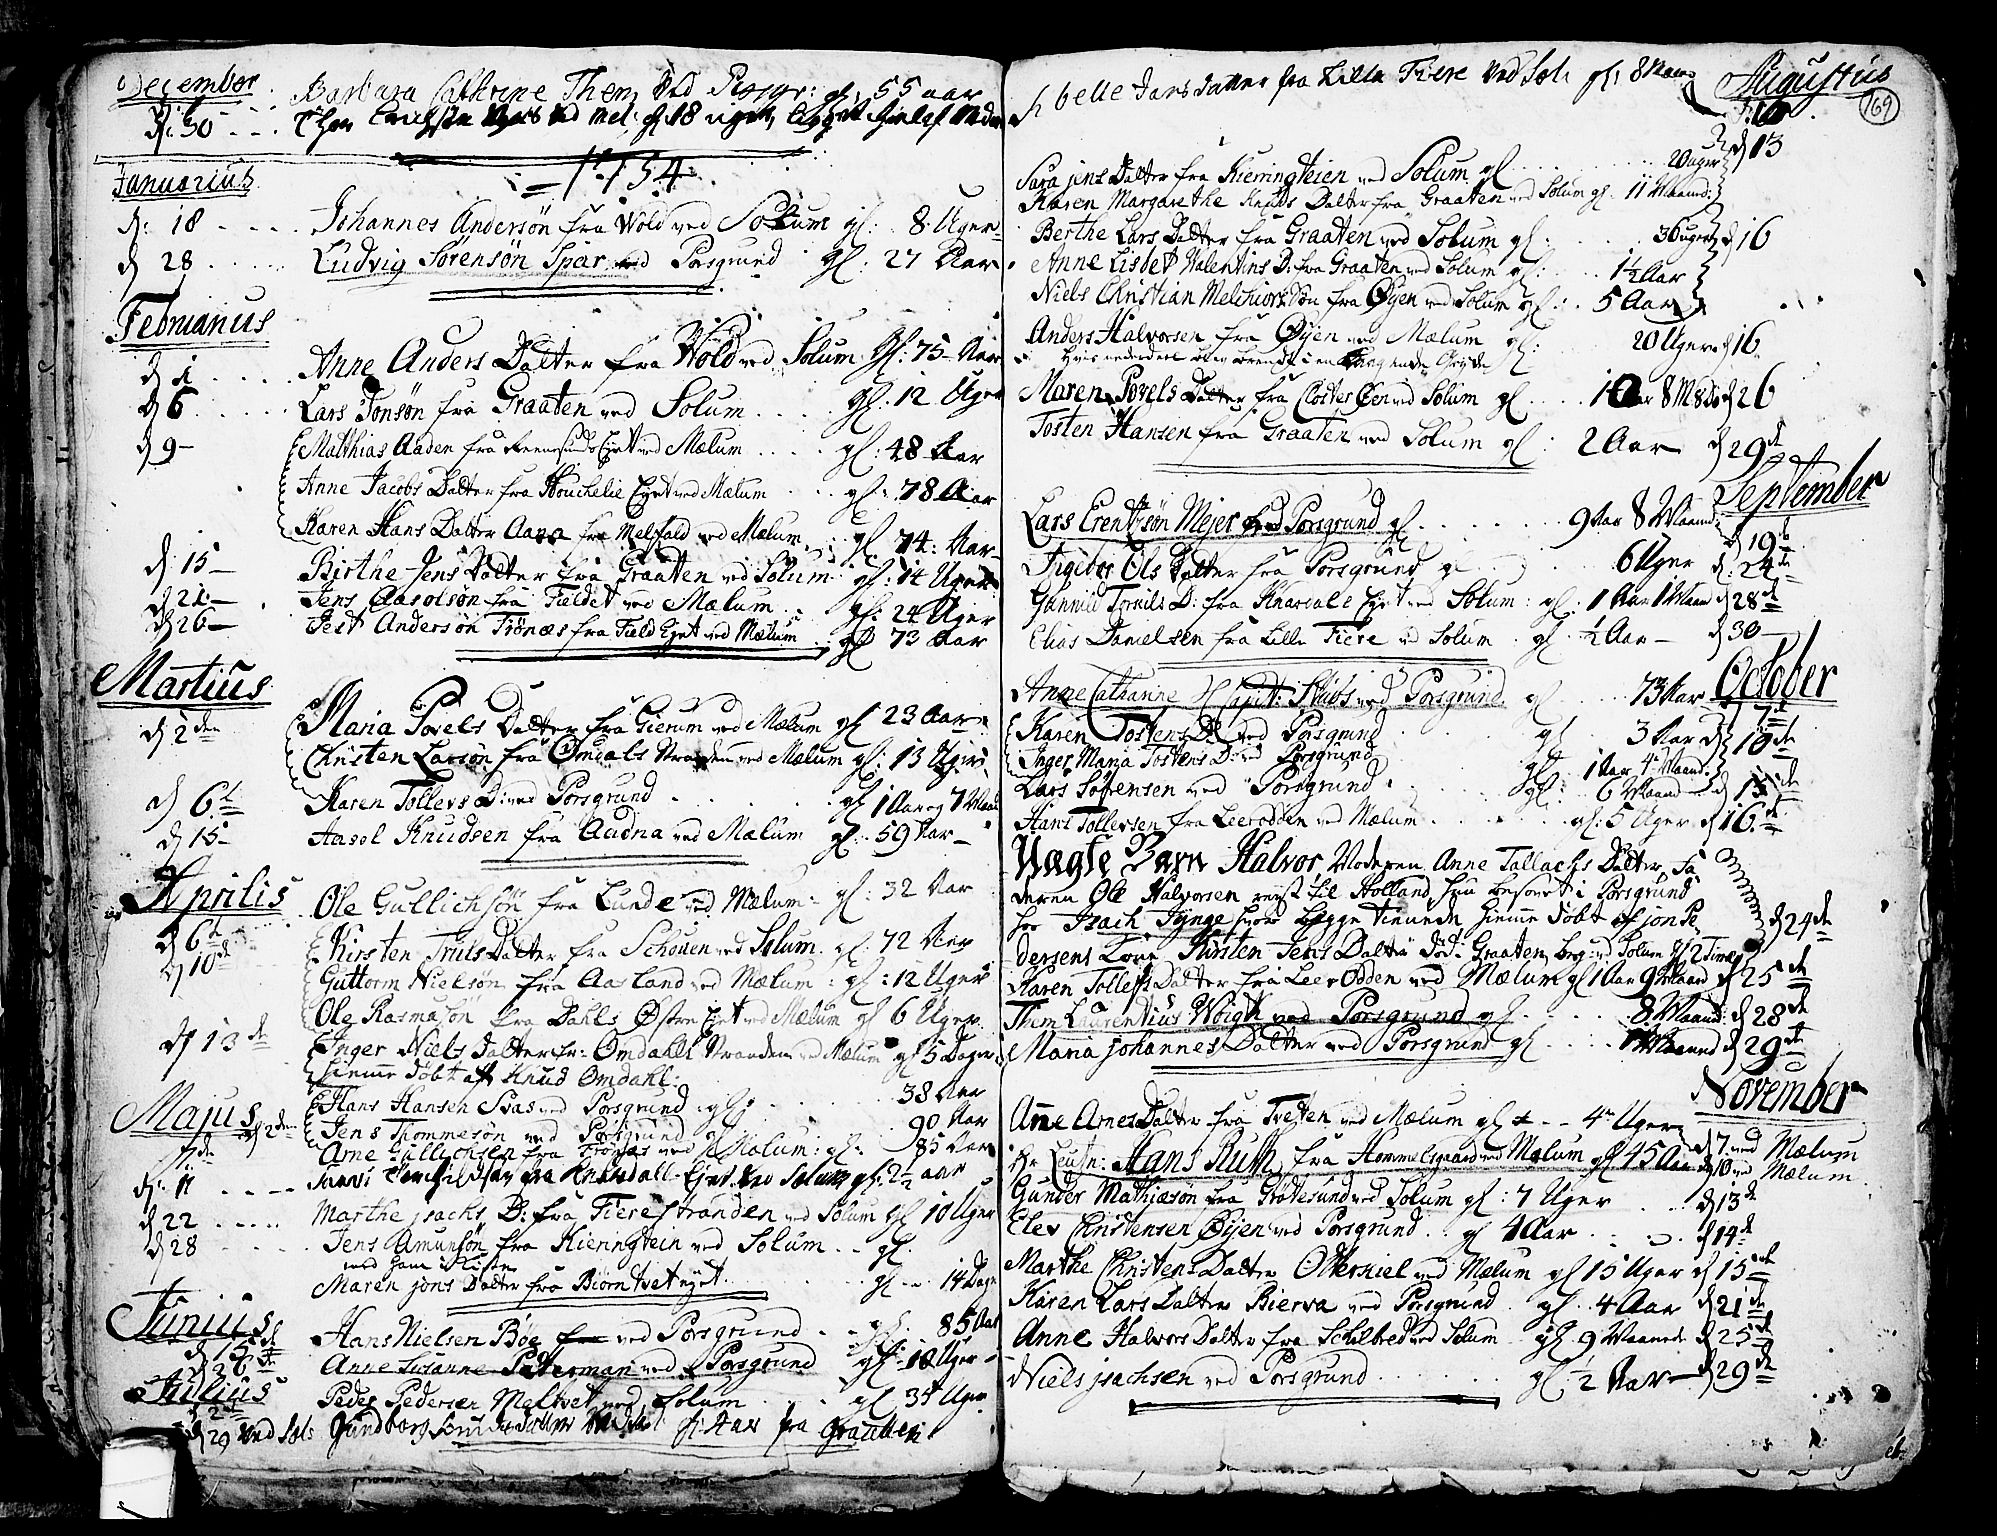 SAKO, Solum kirkebøker, F/Fa/L0002: Ministerialbok nr. I 2, 1713-1761, s. 169